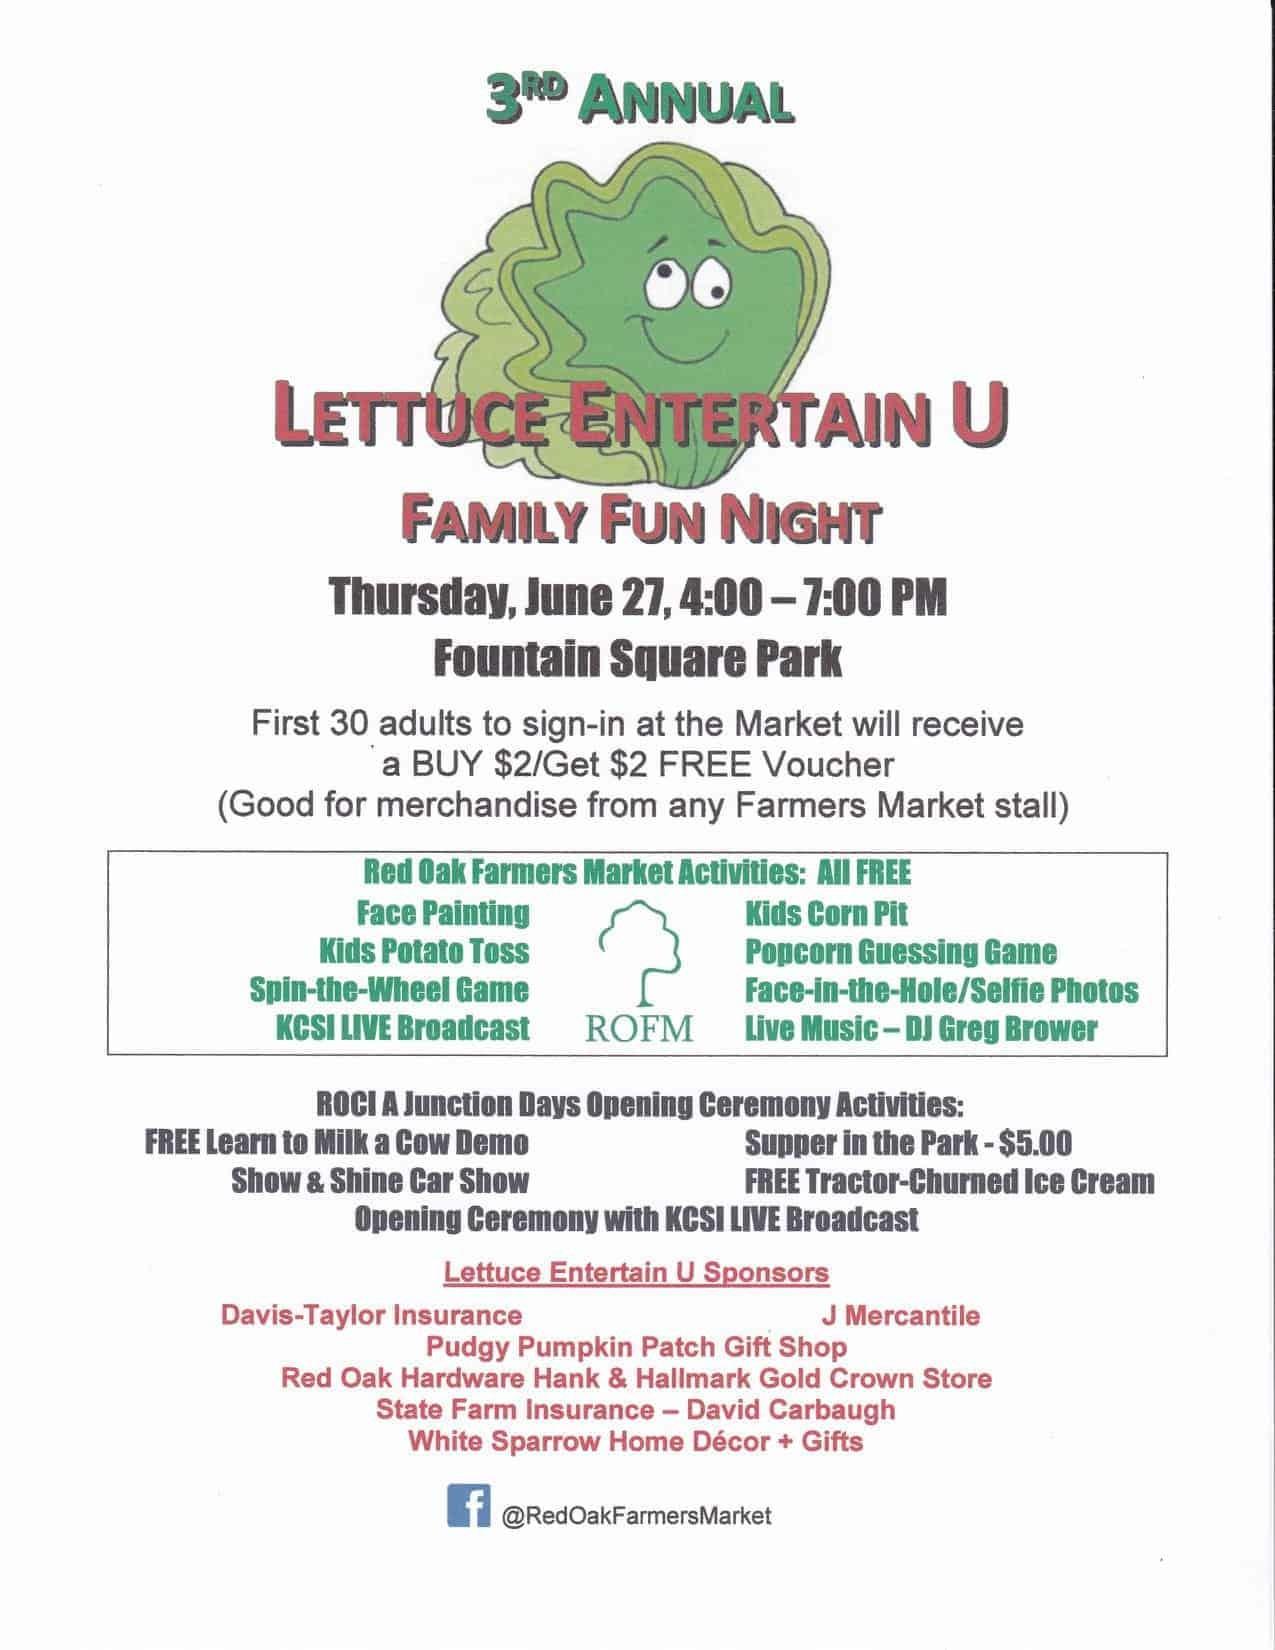 Lettuce Entertain U